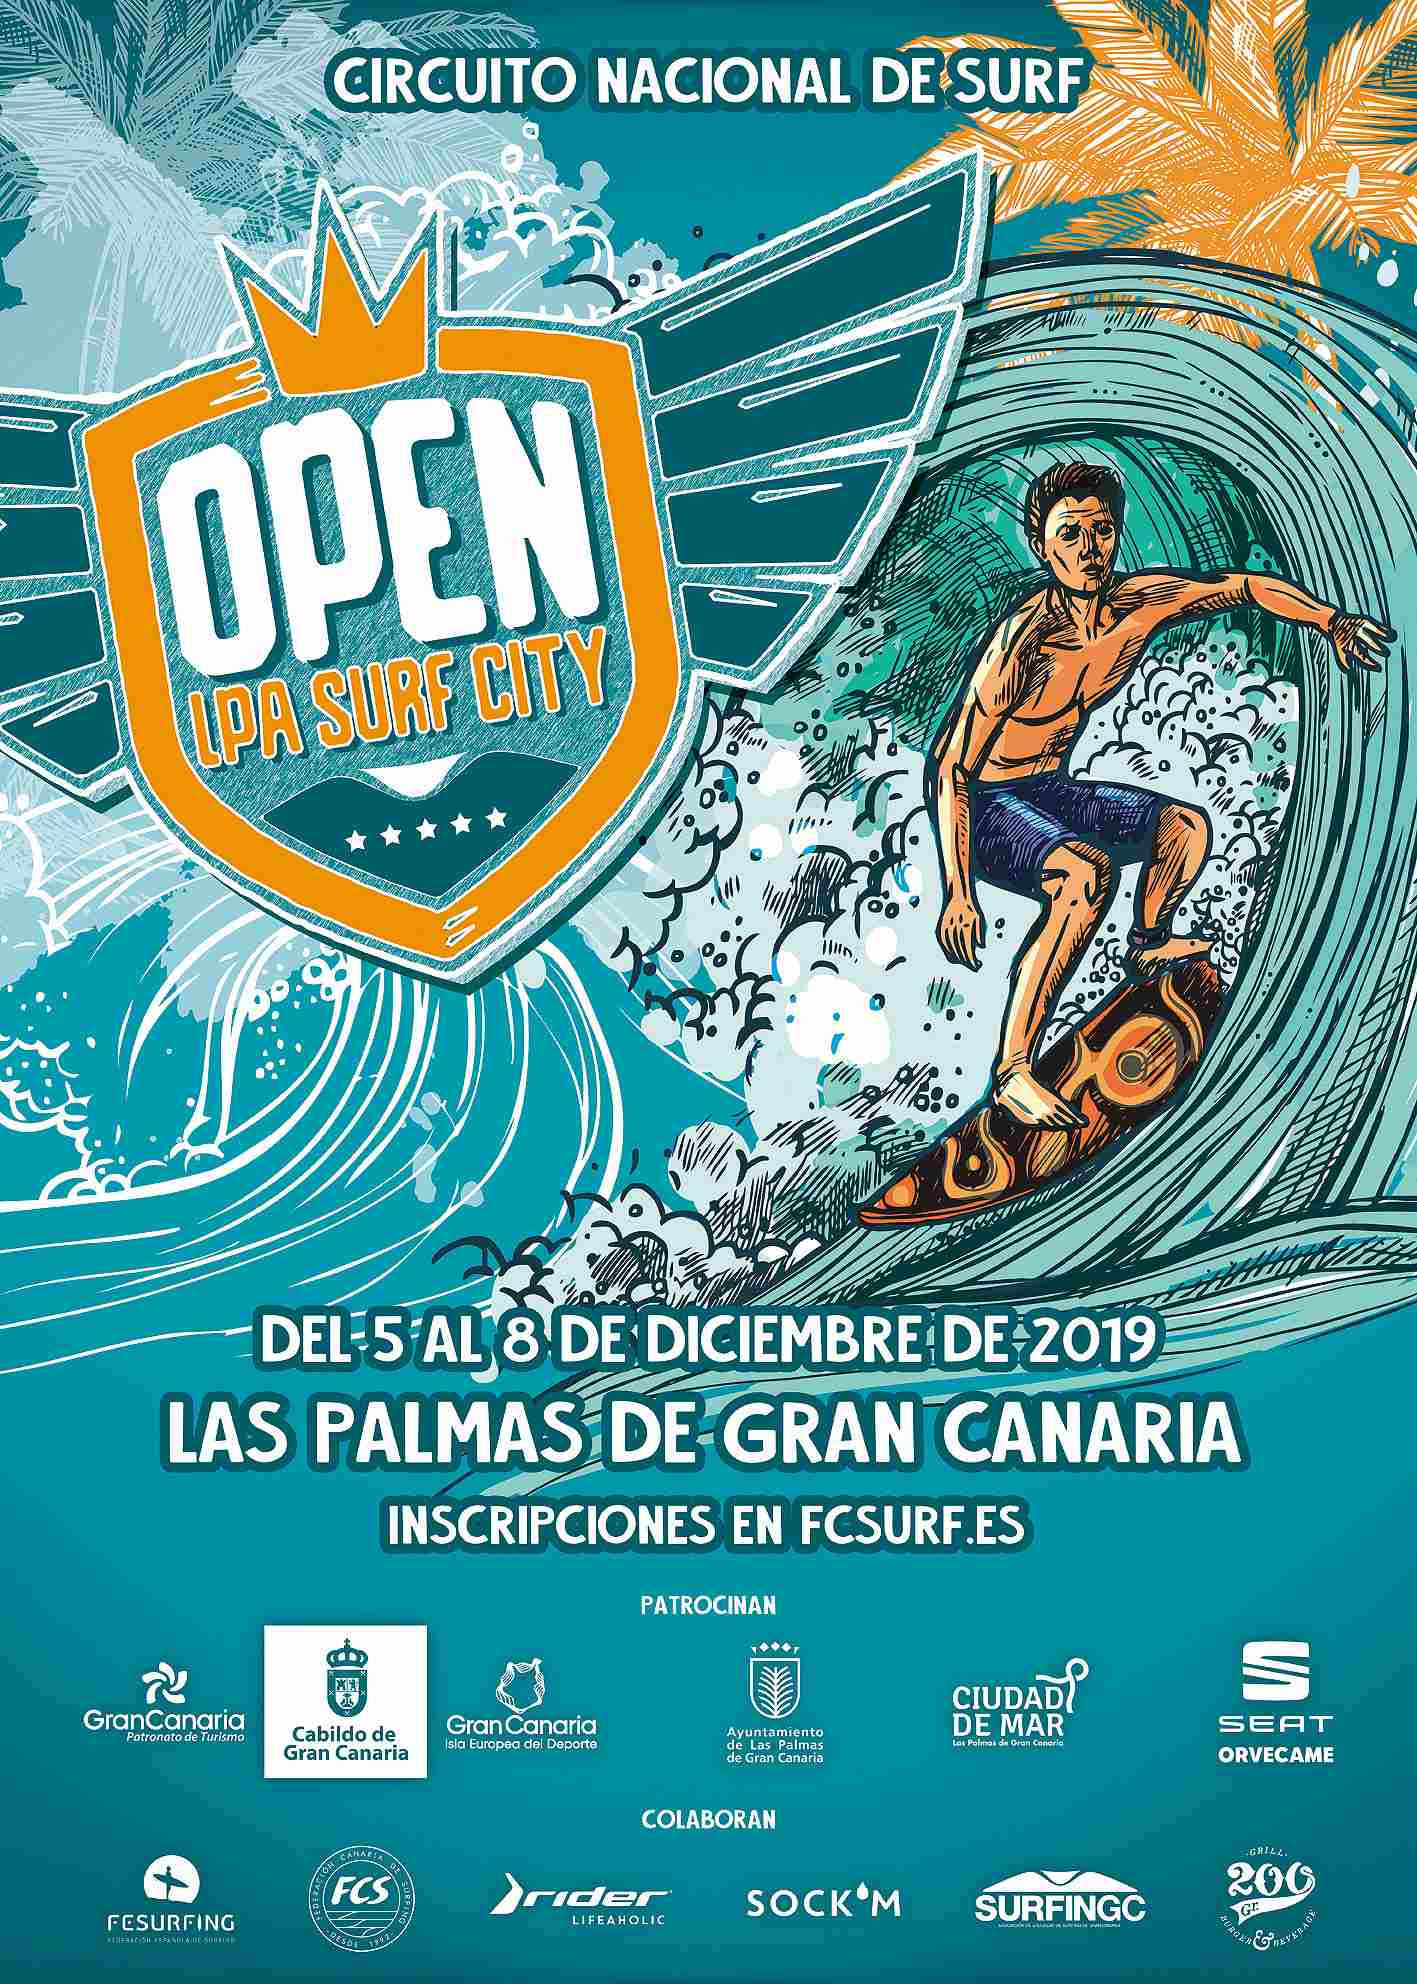 OPEN LPA SURF CITY - Inscríbete